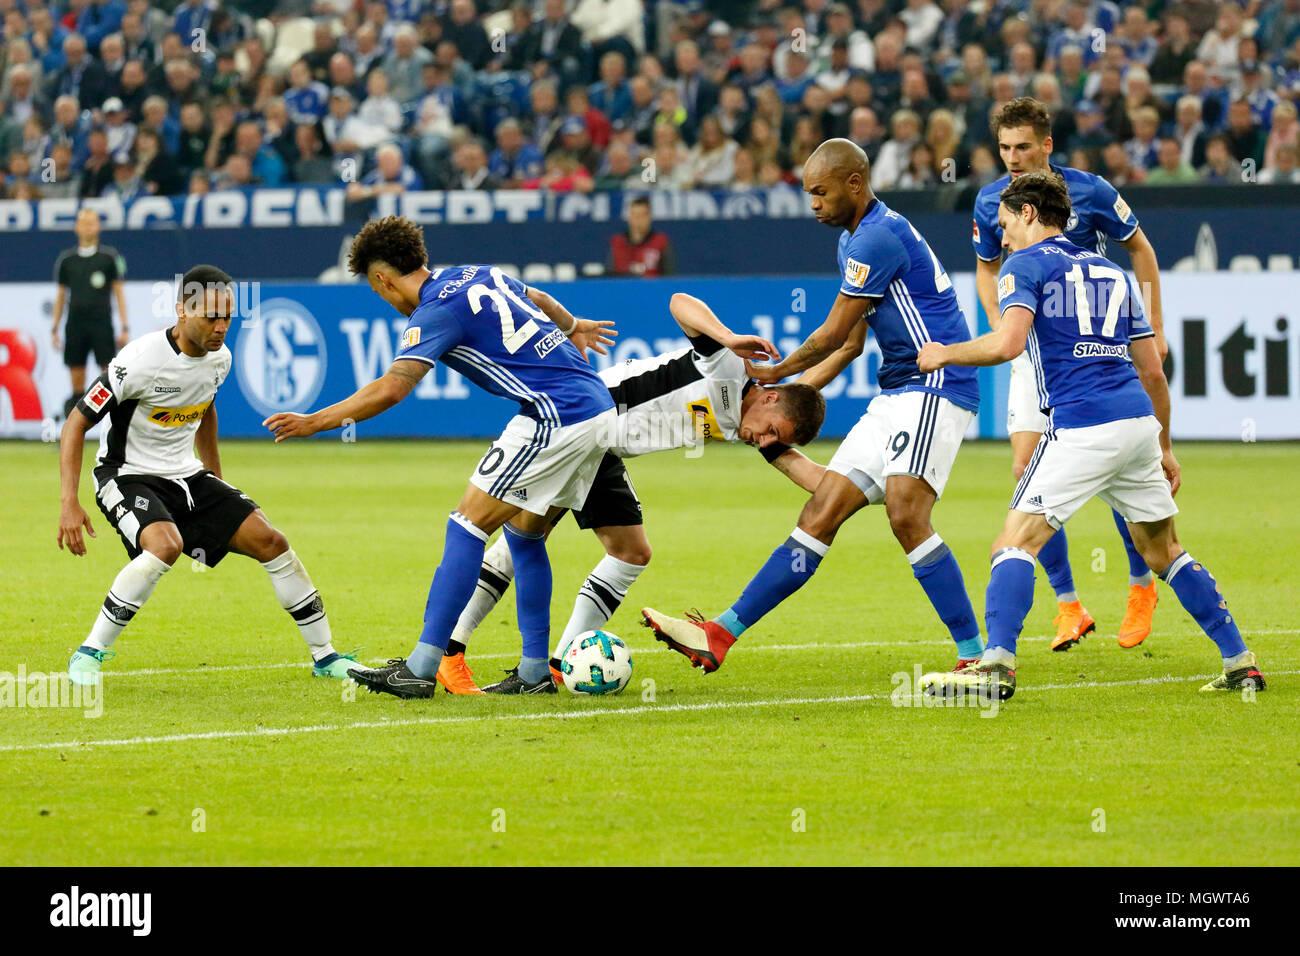 sports, football, Bundesliga, 2017/2018, FC Schalke 04 vs Borussia Moenchengladbach 1:1, Veltins Arena Gelsenkirchen, scene of the match, f.l.t.r. Raffael (MG), Thilo Kehrer (S04), Thorgan Hazard (MG), Naldo (S04), Benjamin Stambouli (S04), Leon Goretzka (S04) - Stock Image